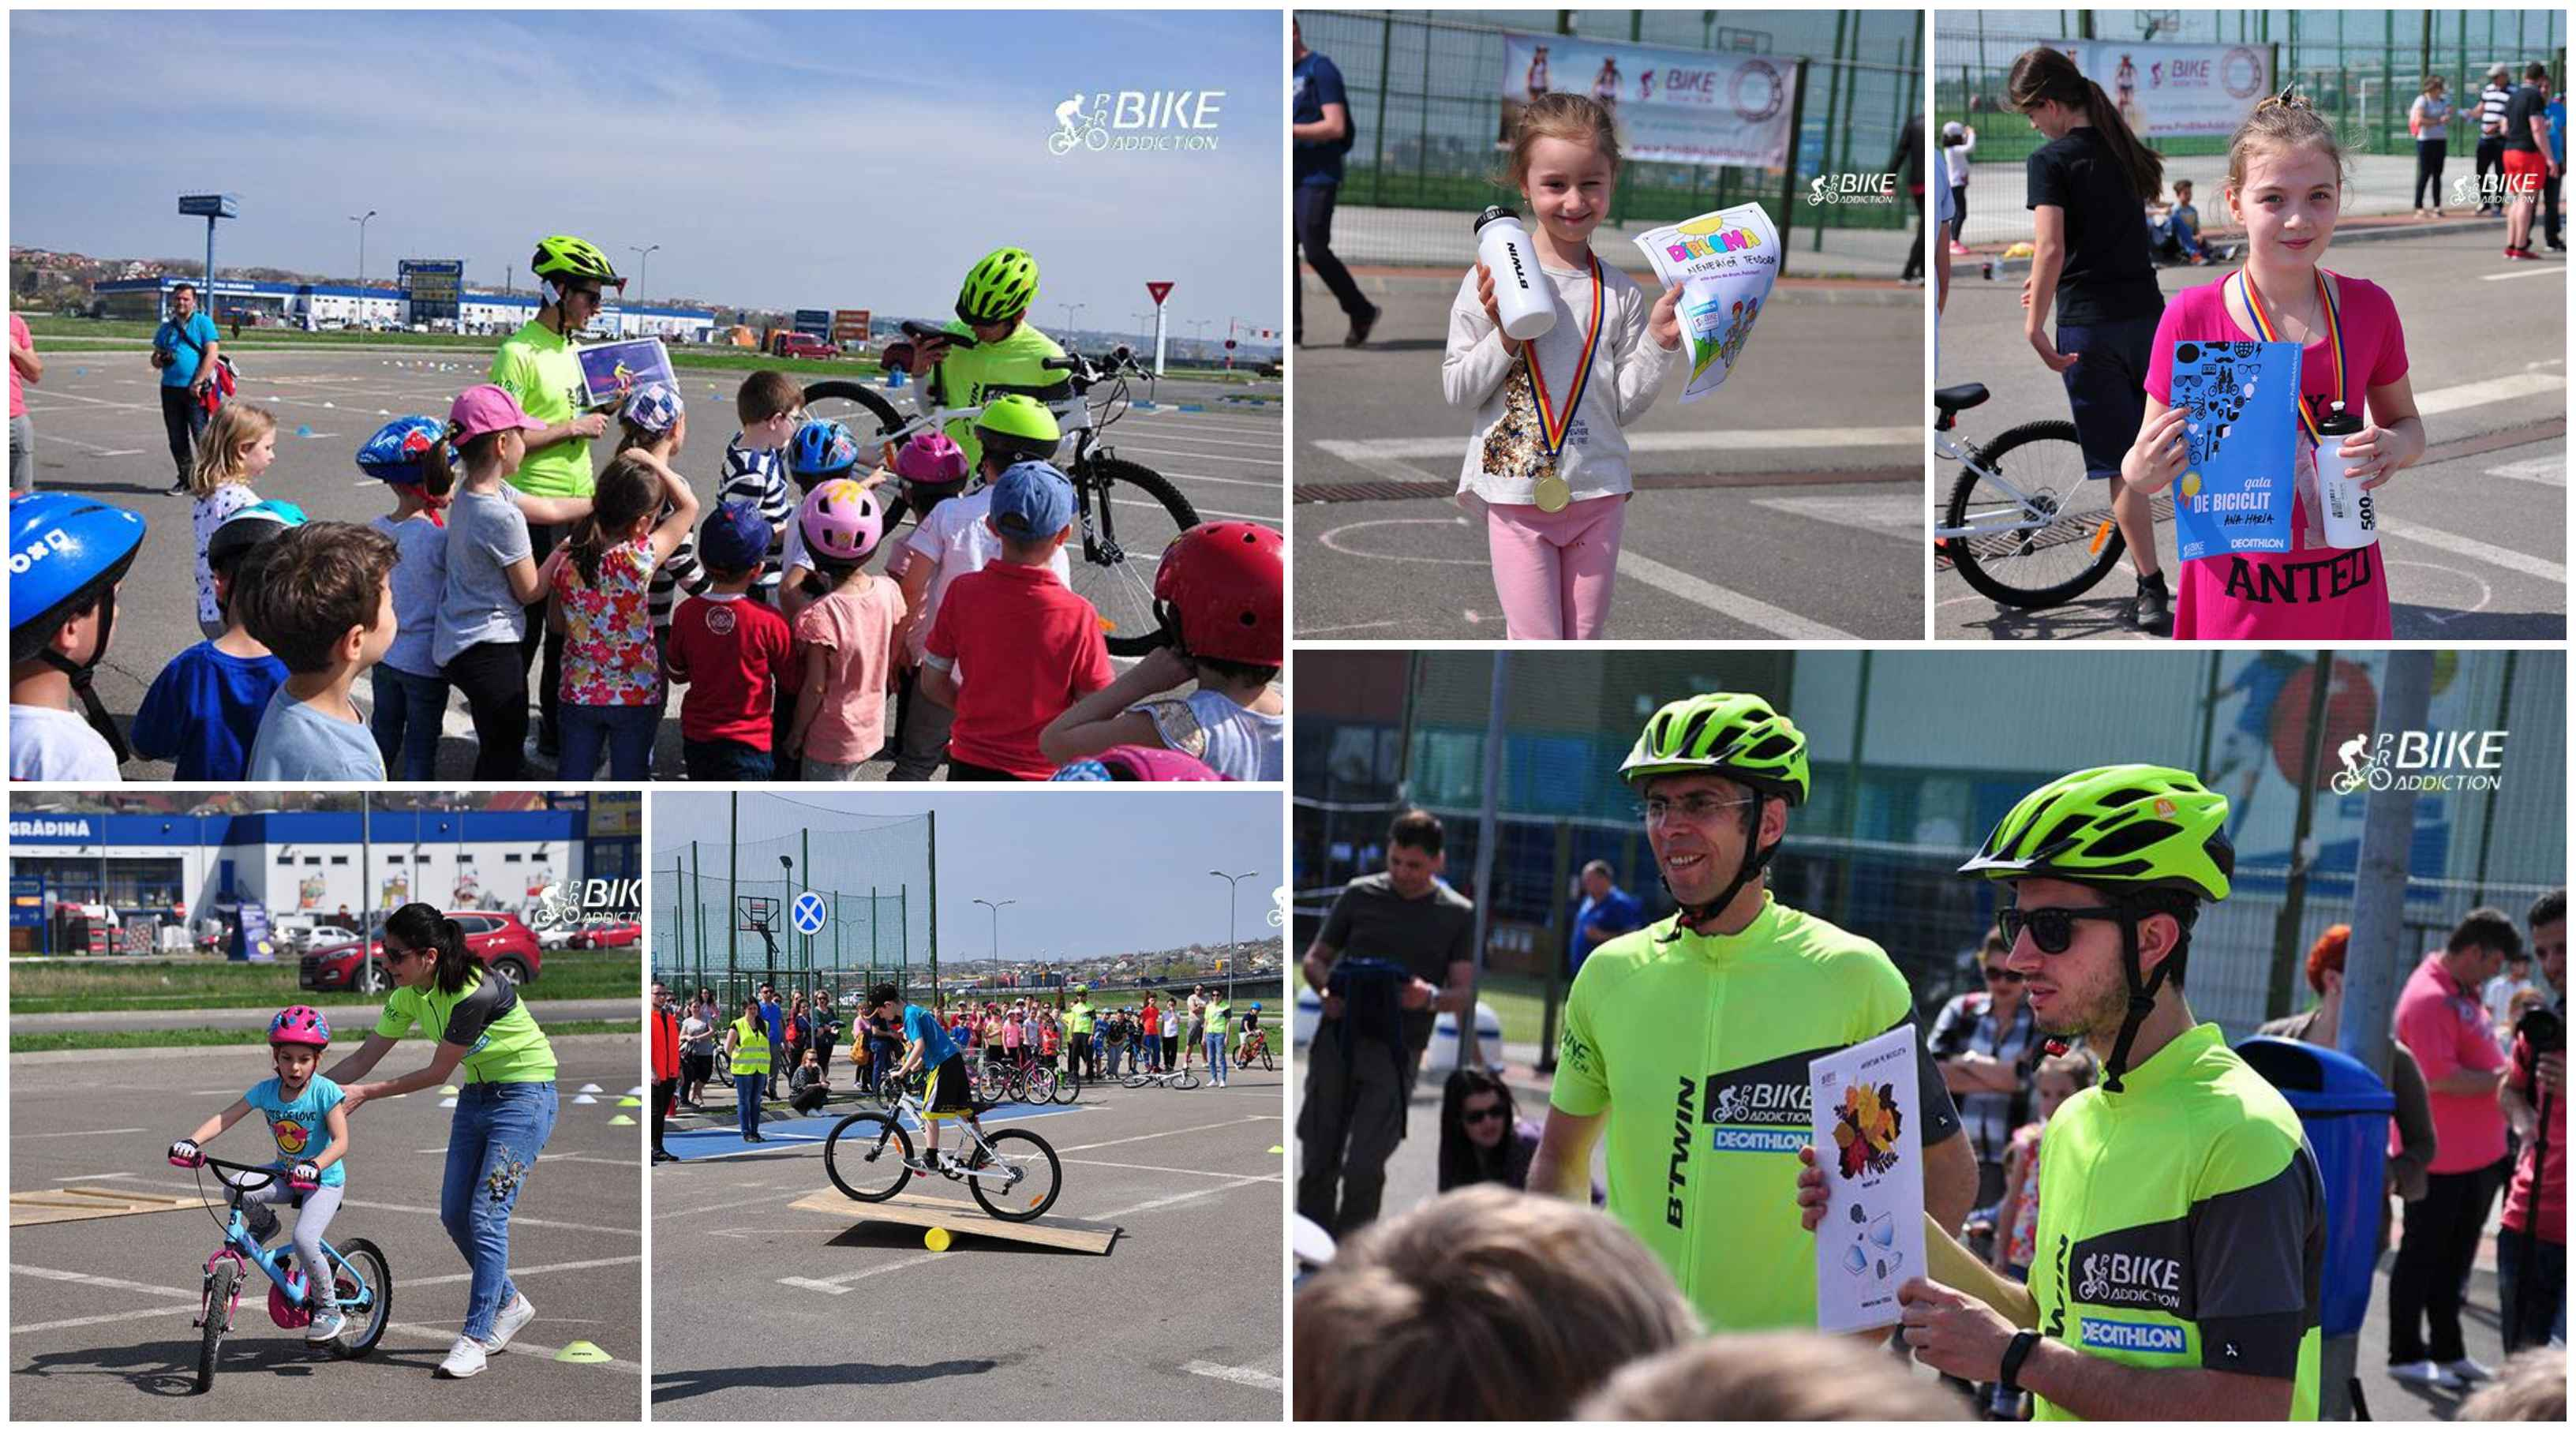 probikeaddiction aventuri pe bicicleta decathlon iasi2